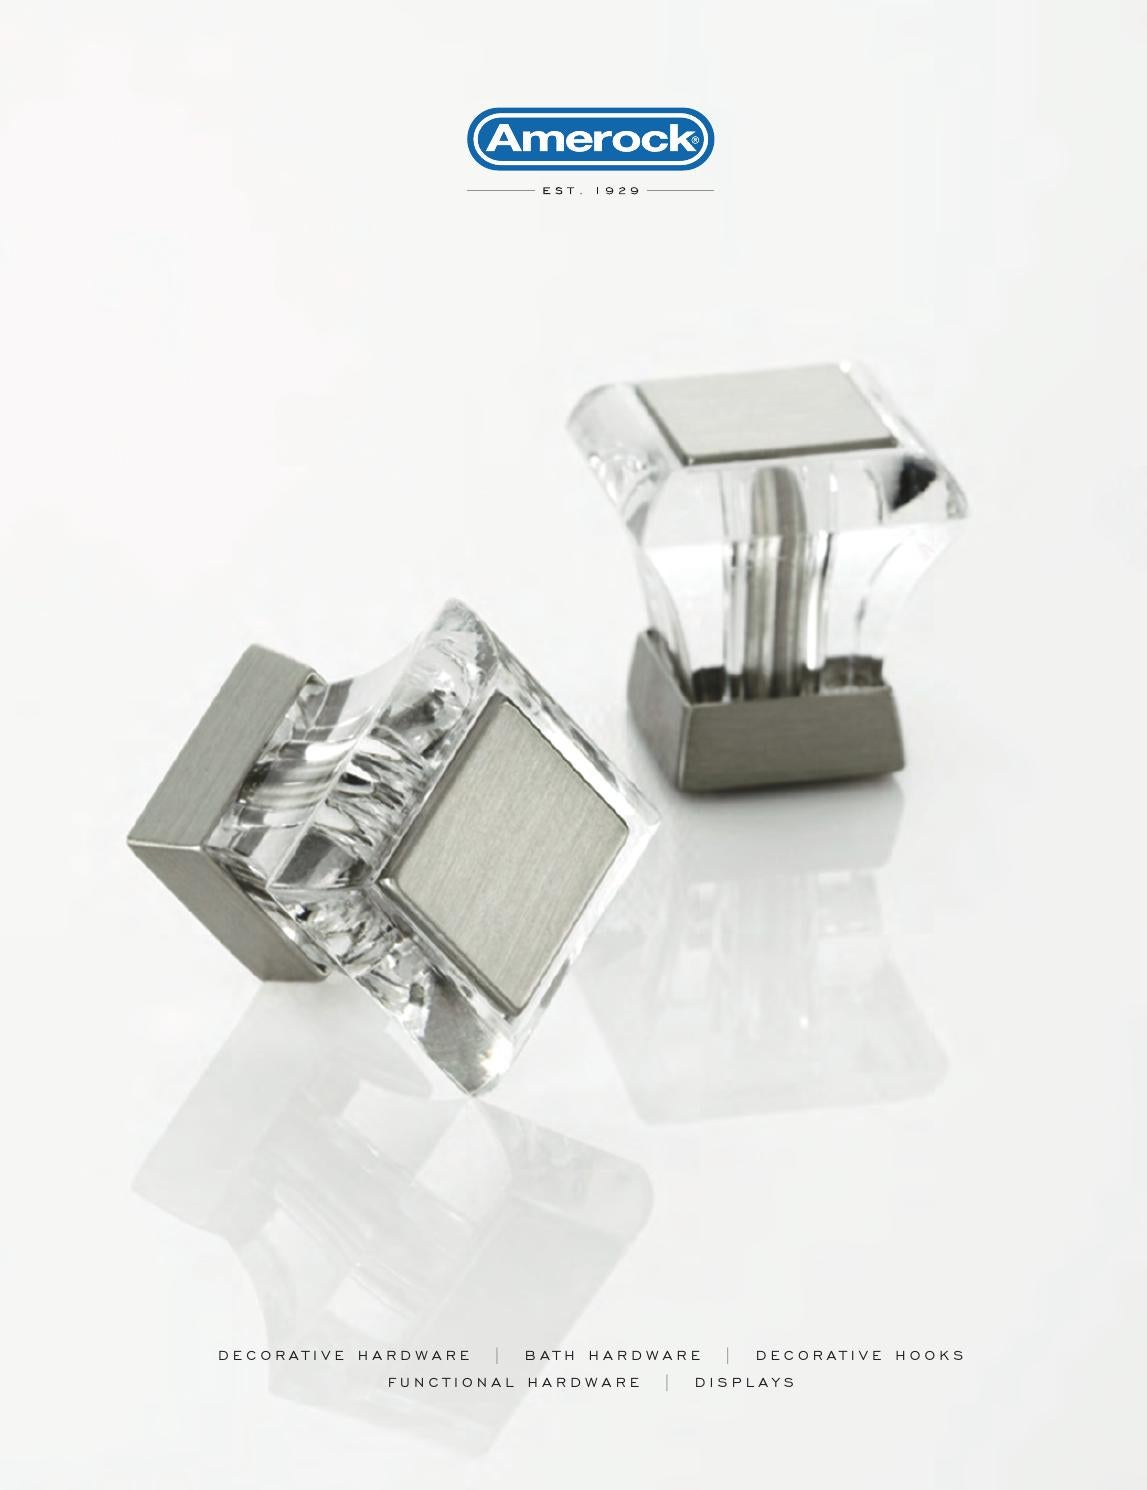 6 Pk Amerock White Ceramic /& Polished Brass Cabinet Door Handle Pull 14222WPB